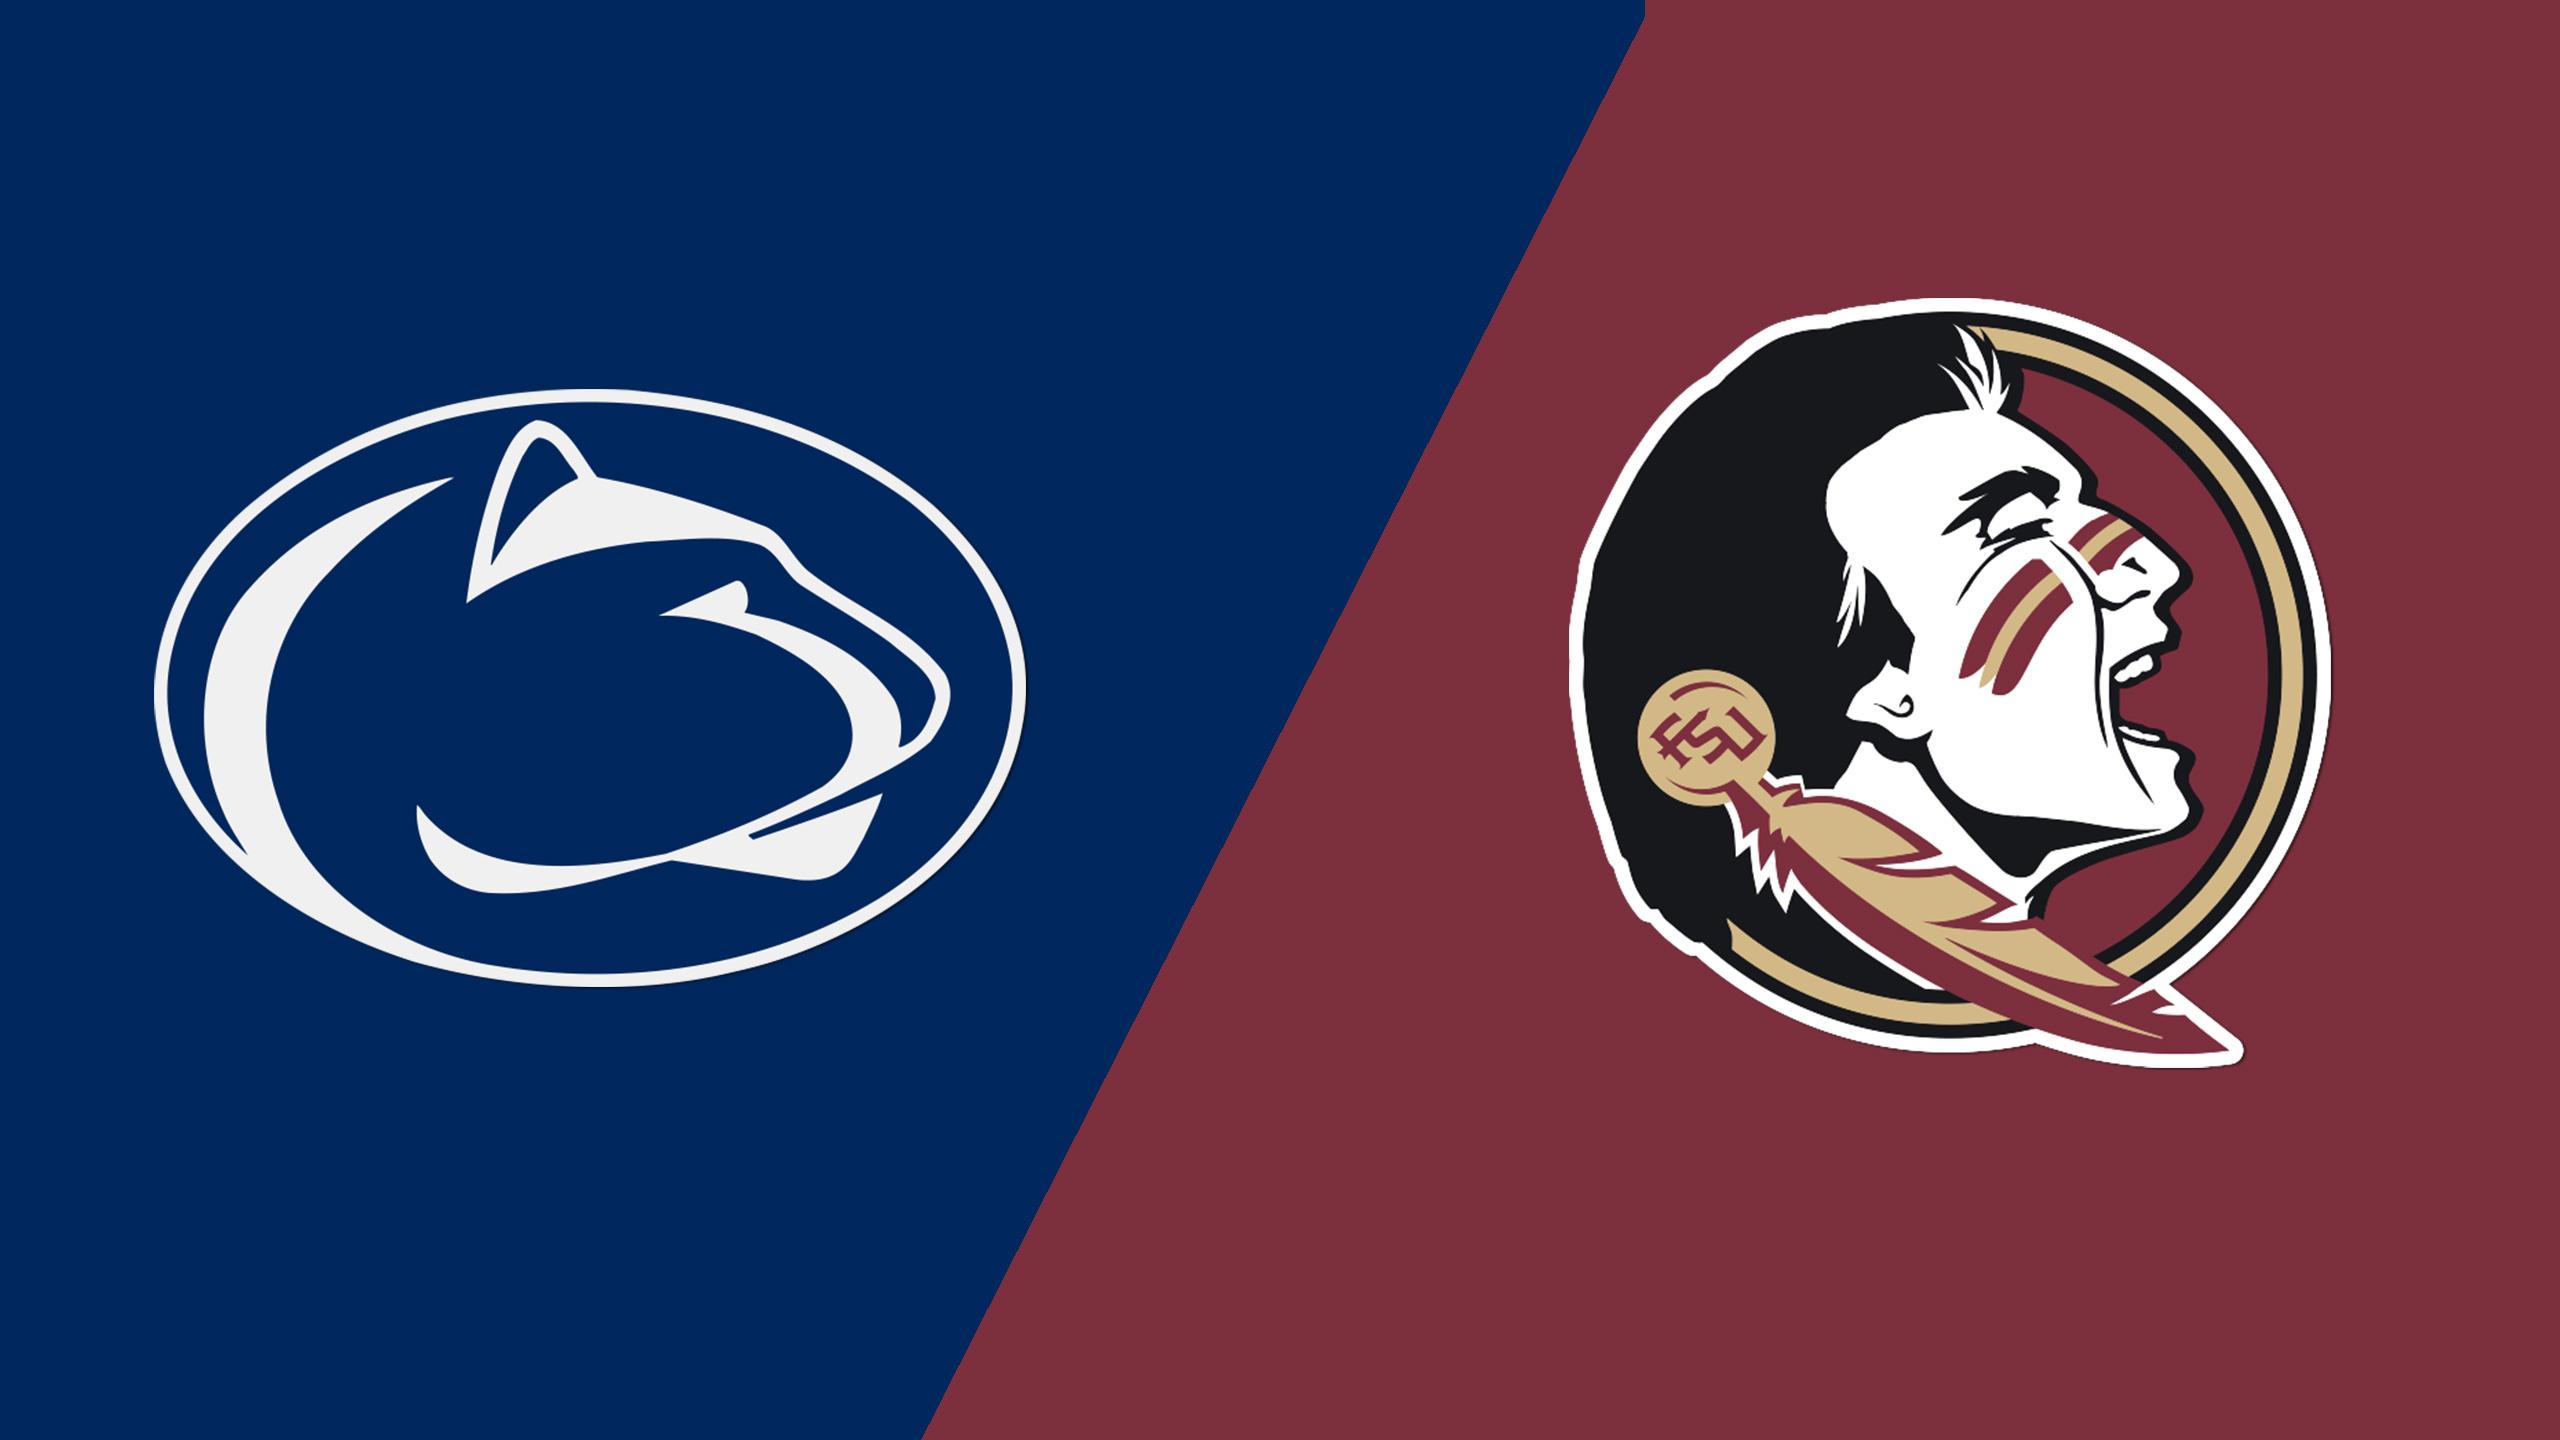 Penn State vs. #1 Florida State (Quarterfinal) (NCAA Division I Women's Soccer Championship)